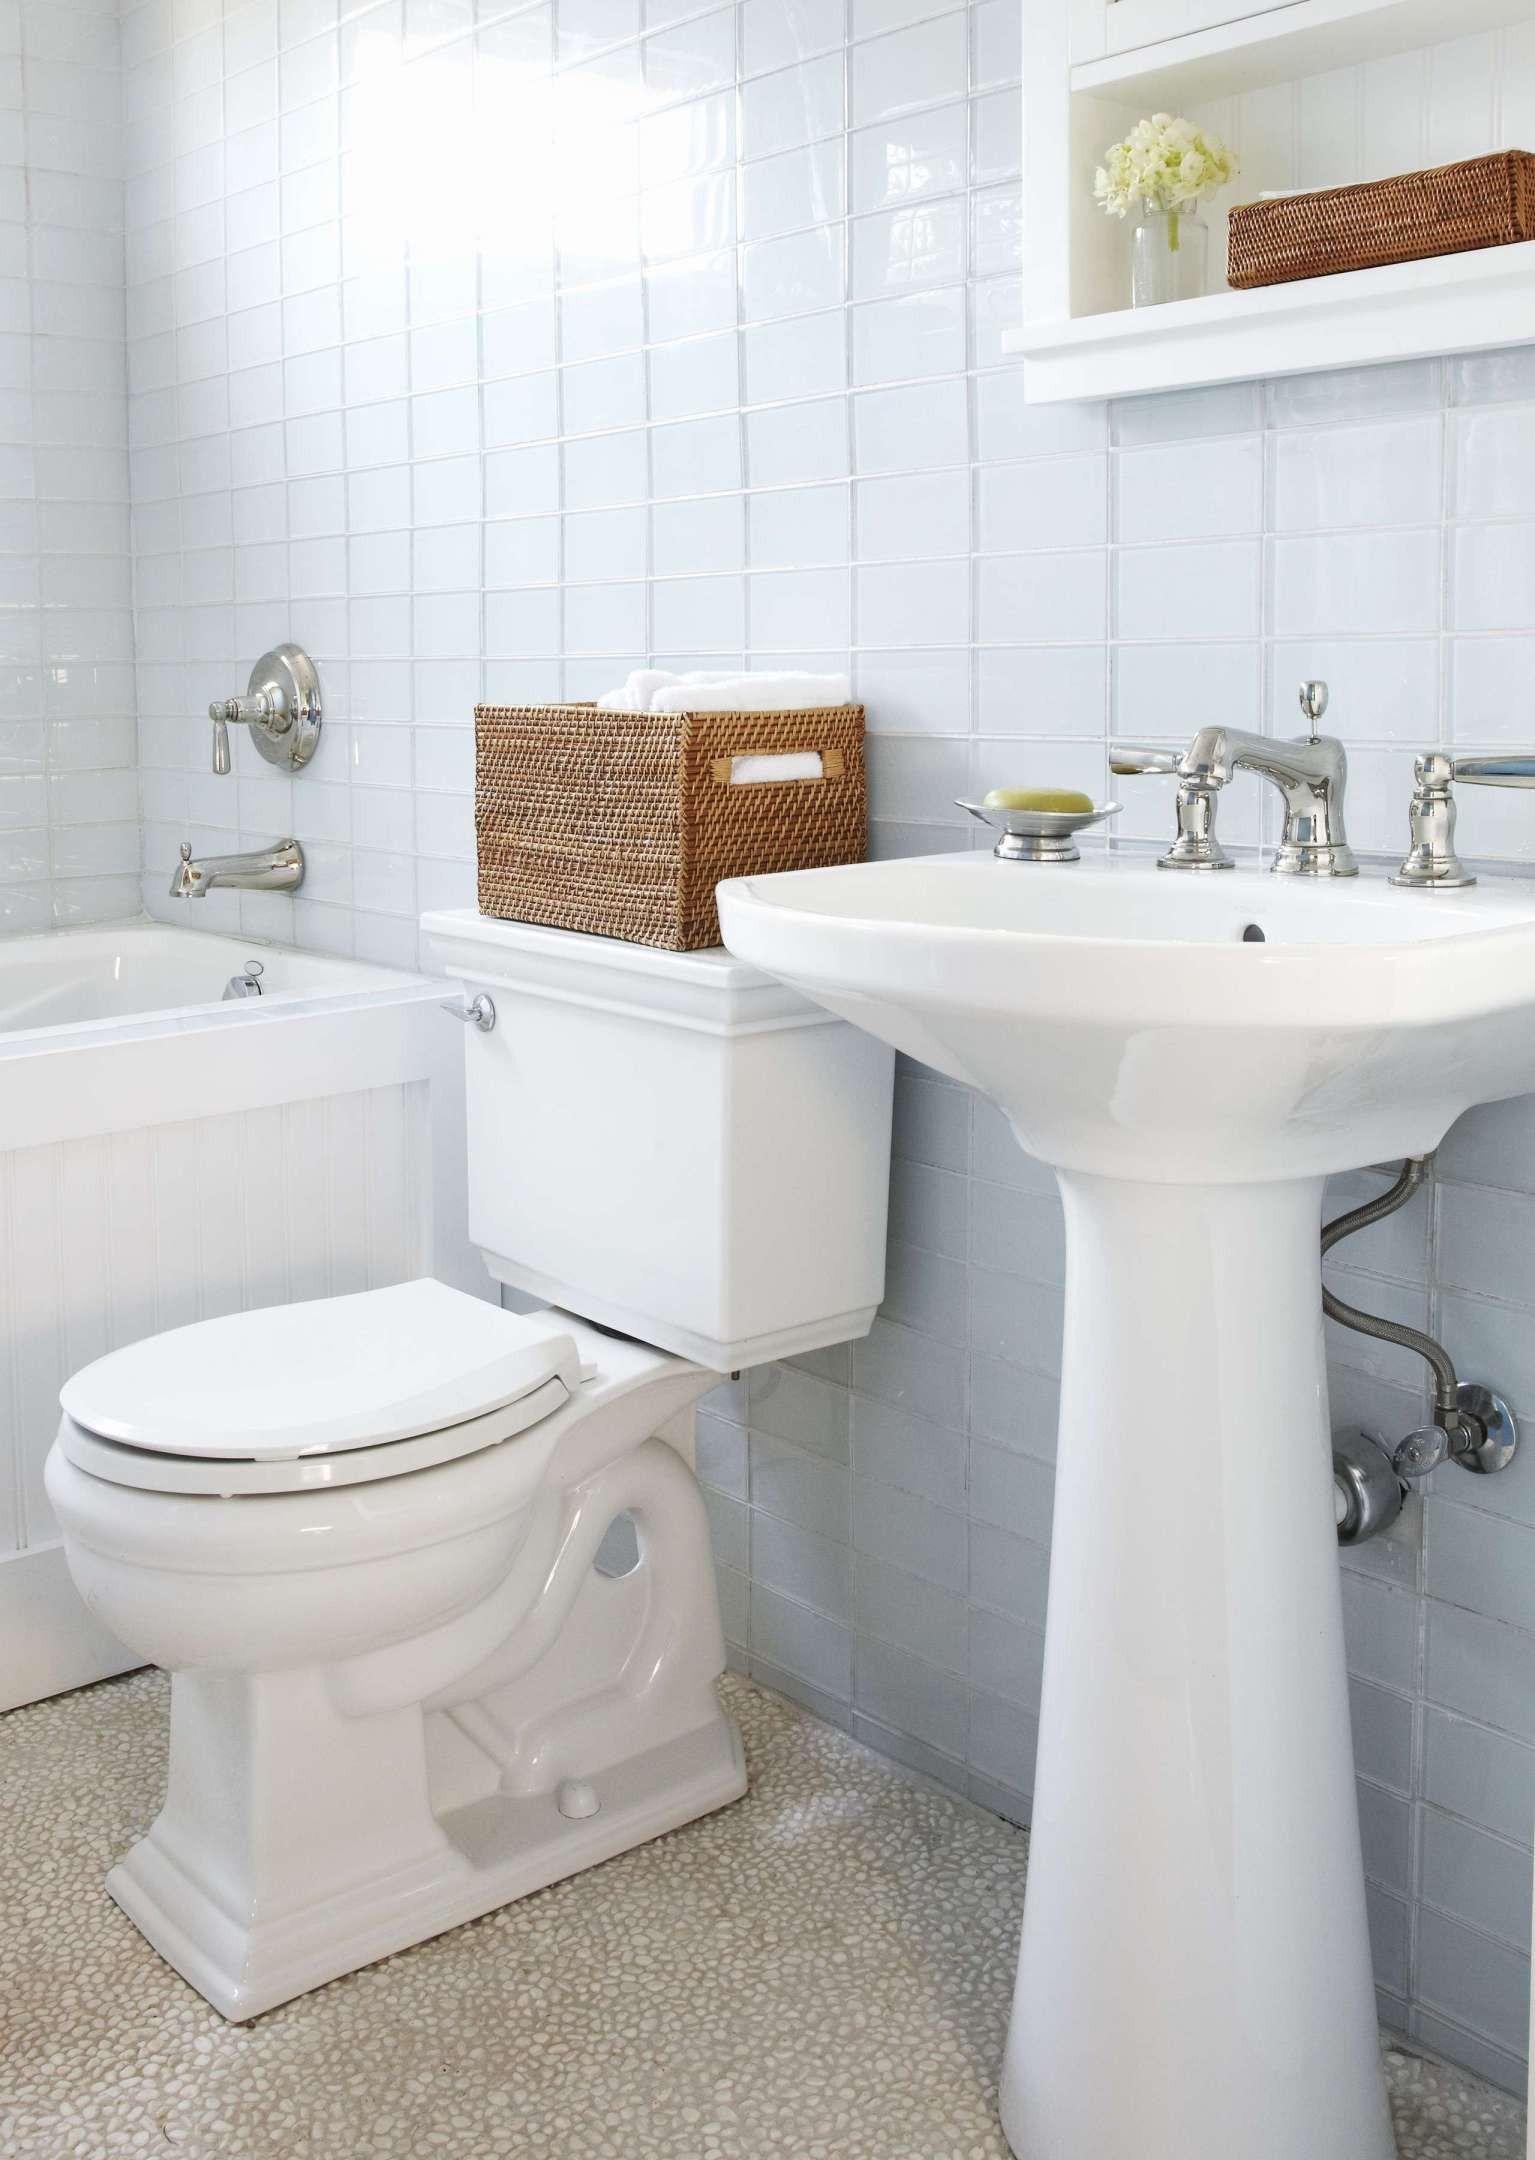 Lovely Outdoor Toilet Small Bathroom Tiny House Bathroom Small Bathroom Vanities